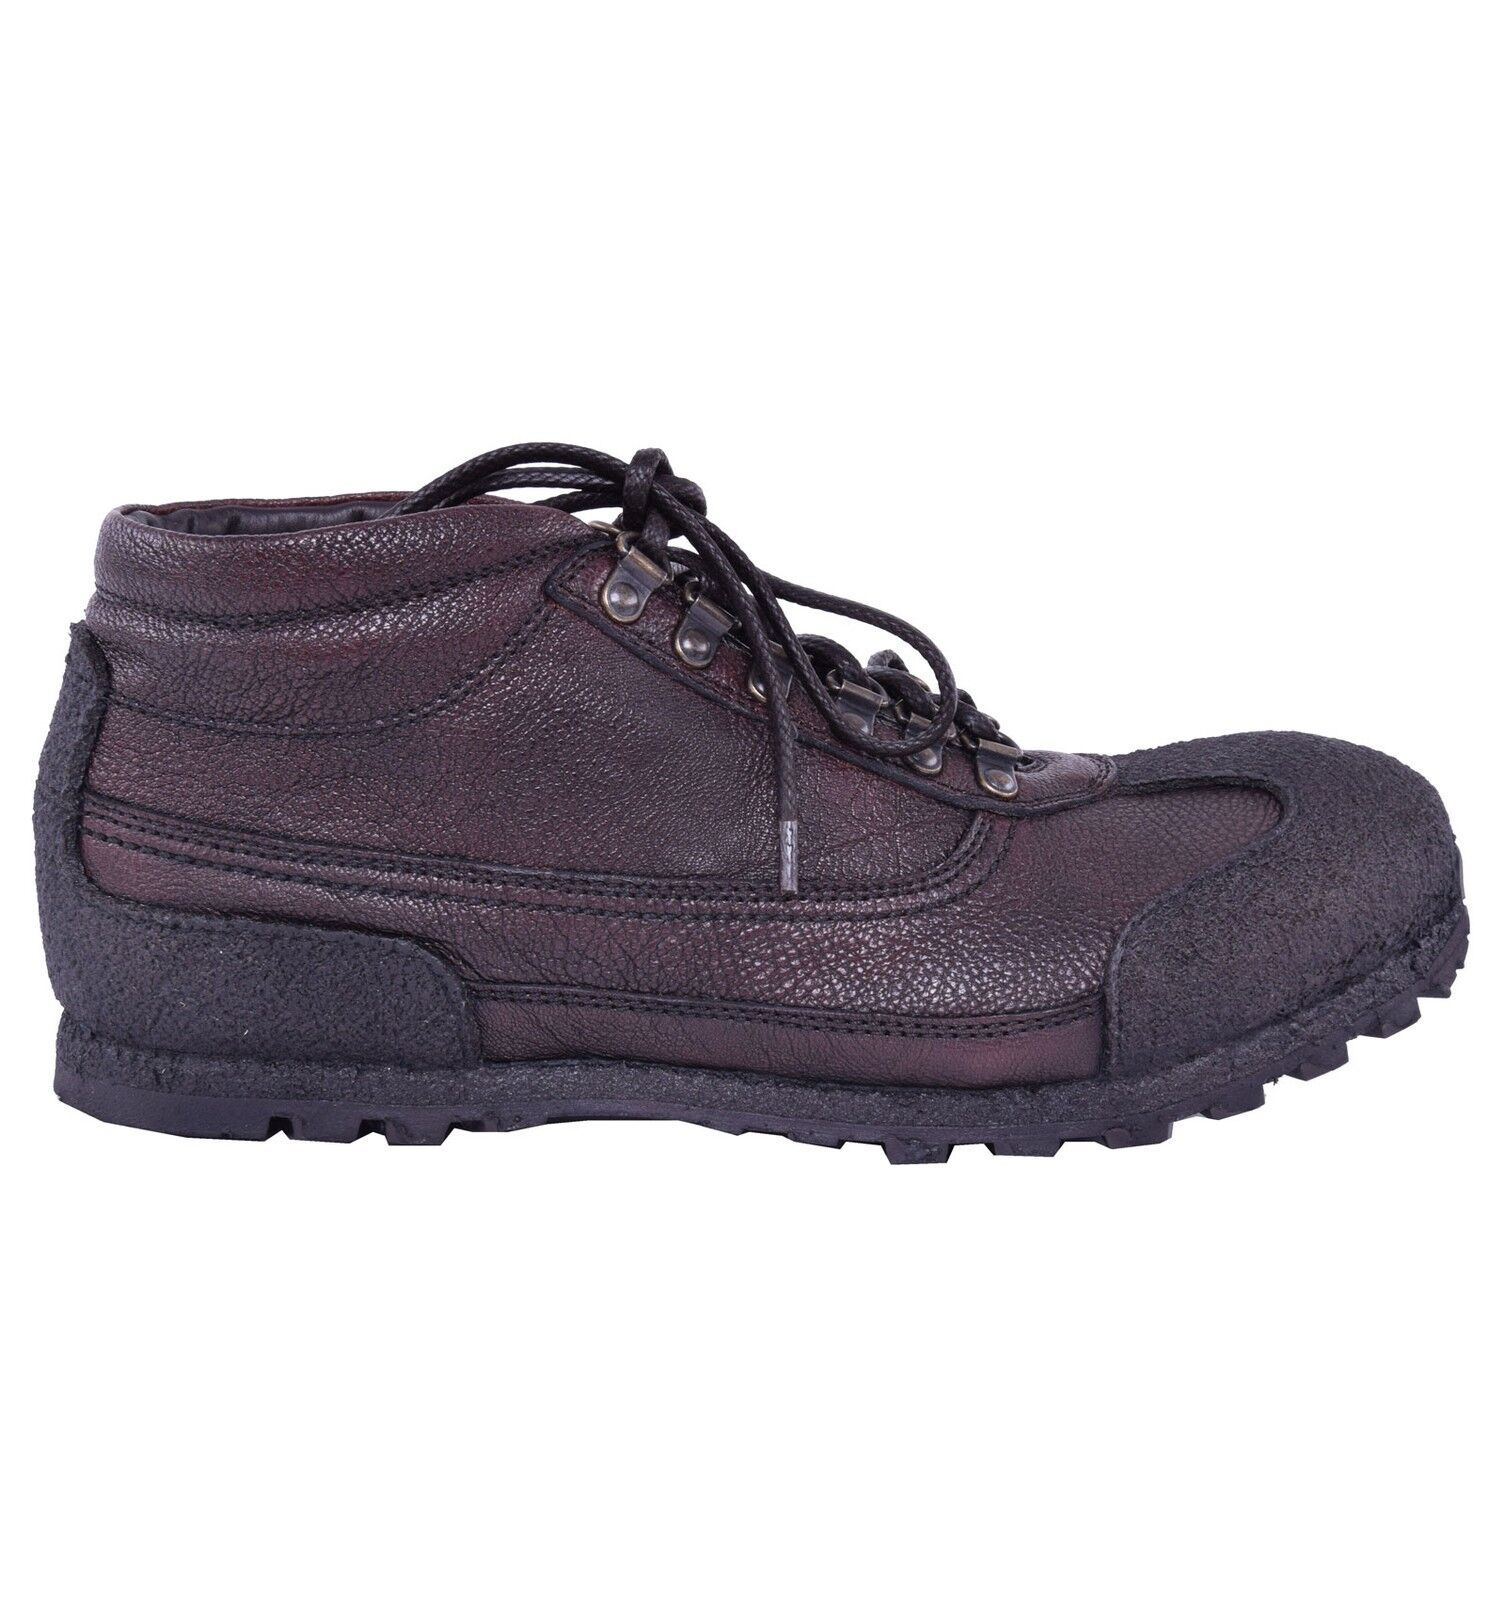 Dolce & Gabbana Bergsteiger-Stil Ankle Boots Shoes Braun Boots Brown 03831